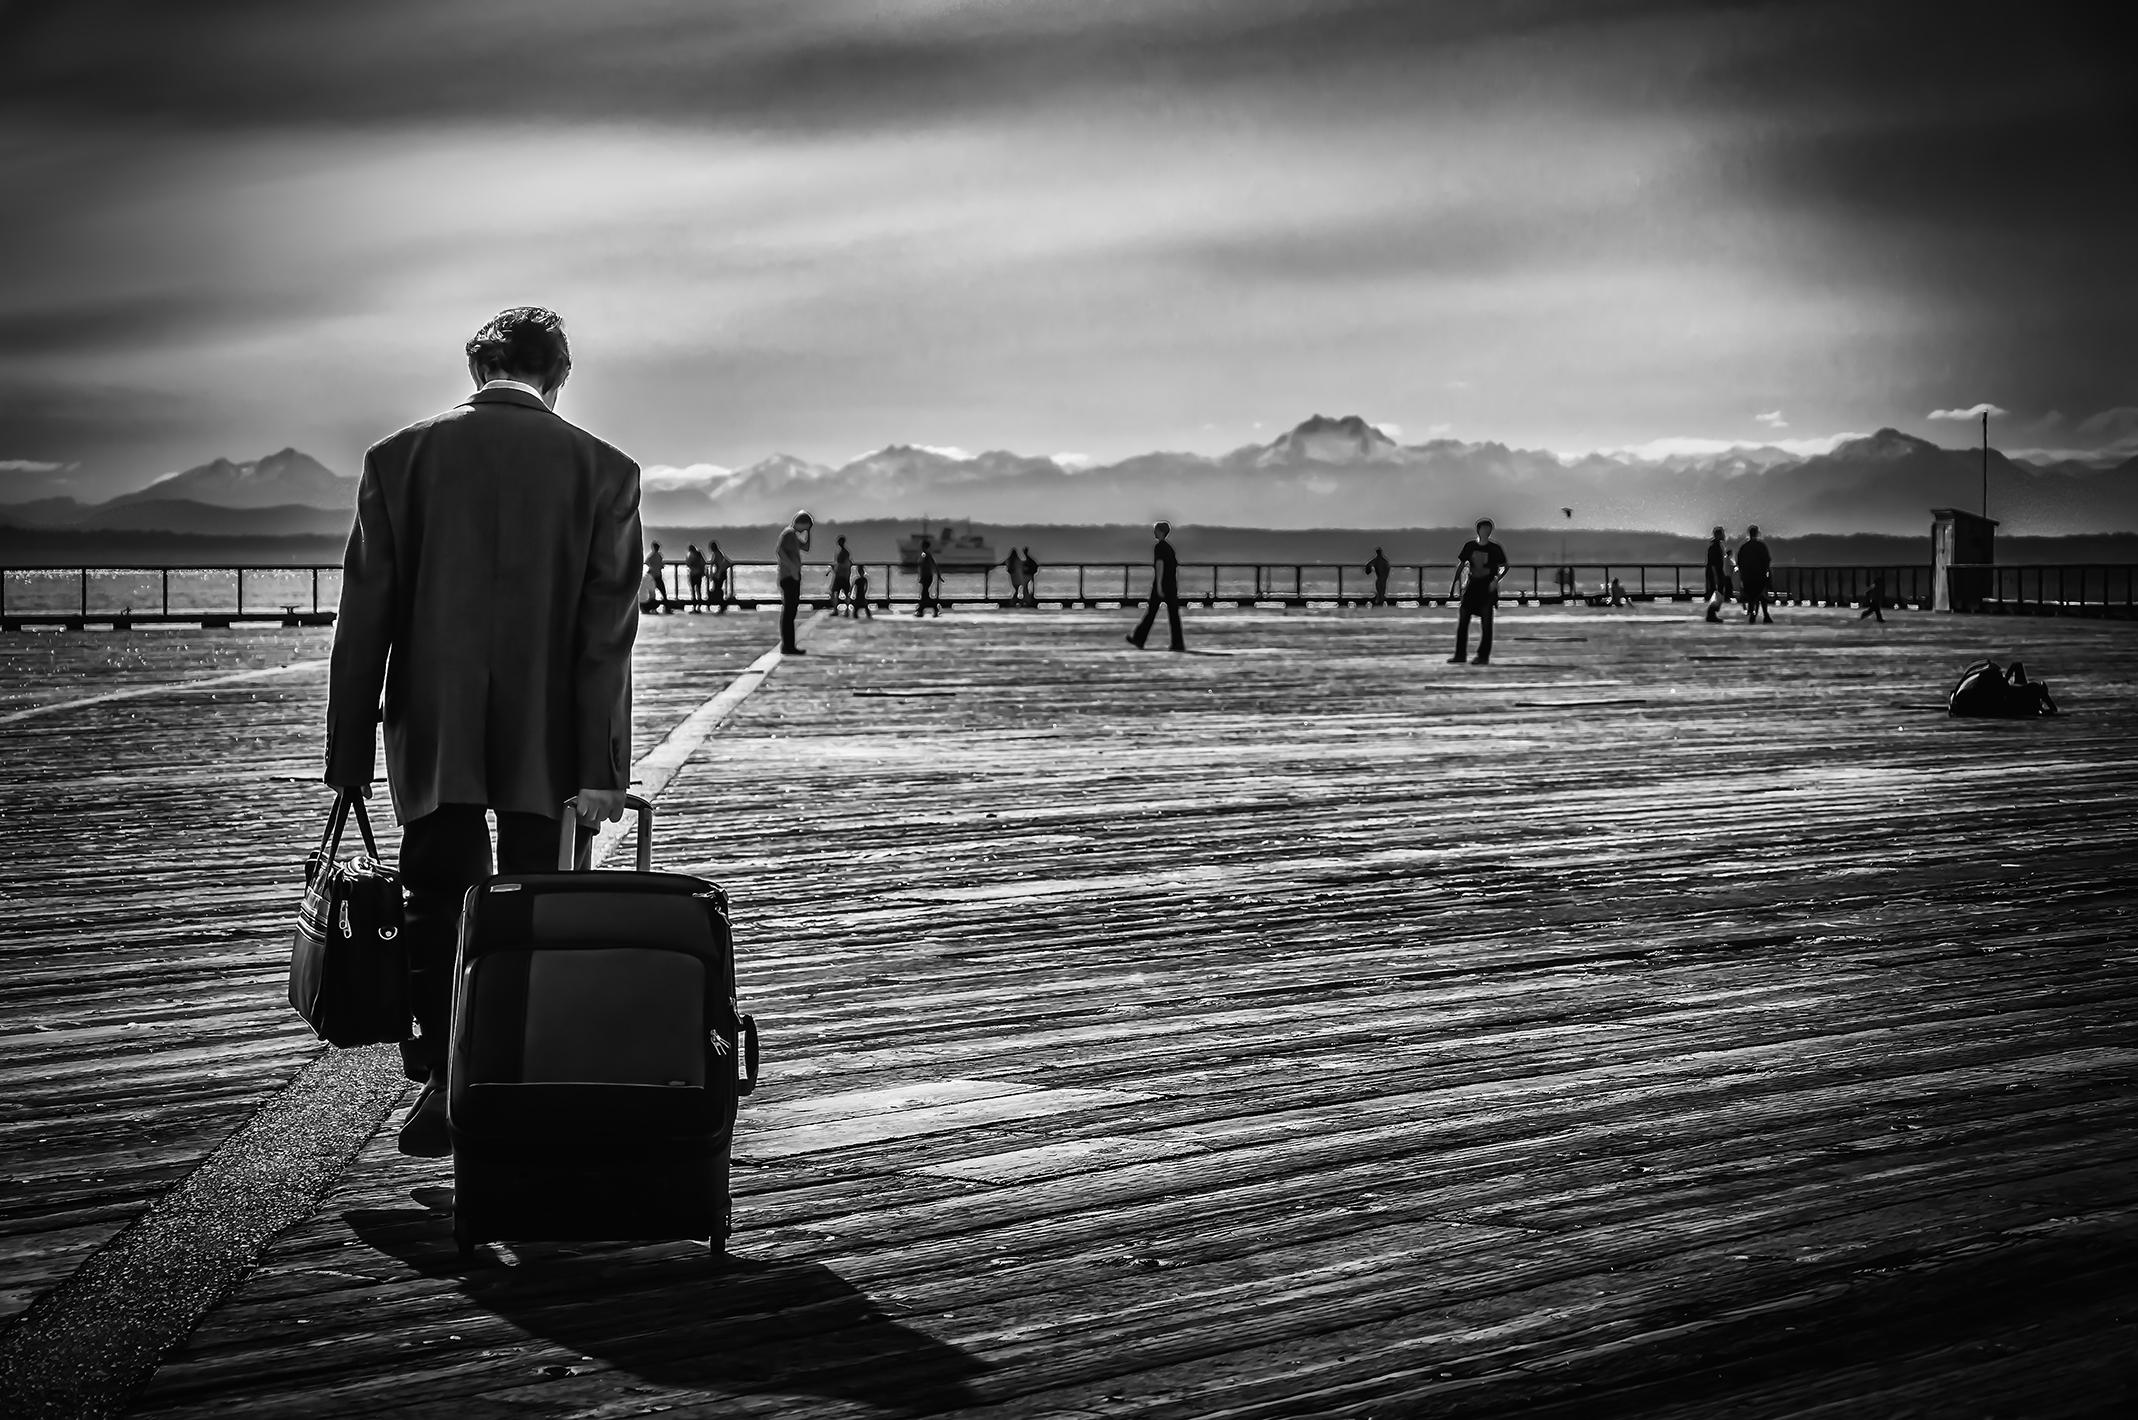 The Traveller - Seattle, WA - U.S.A. Nikon D90 - Nikkor 18-105mm f/3.5-4.5